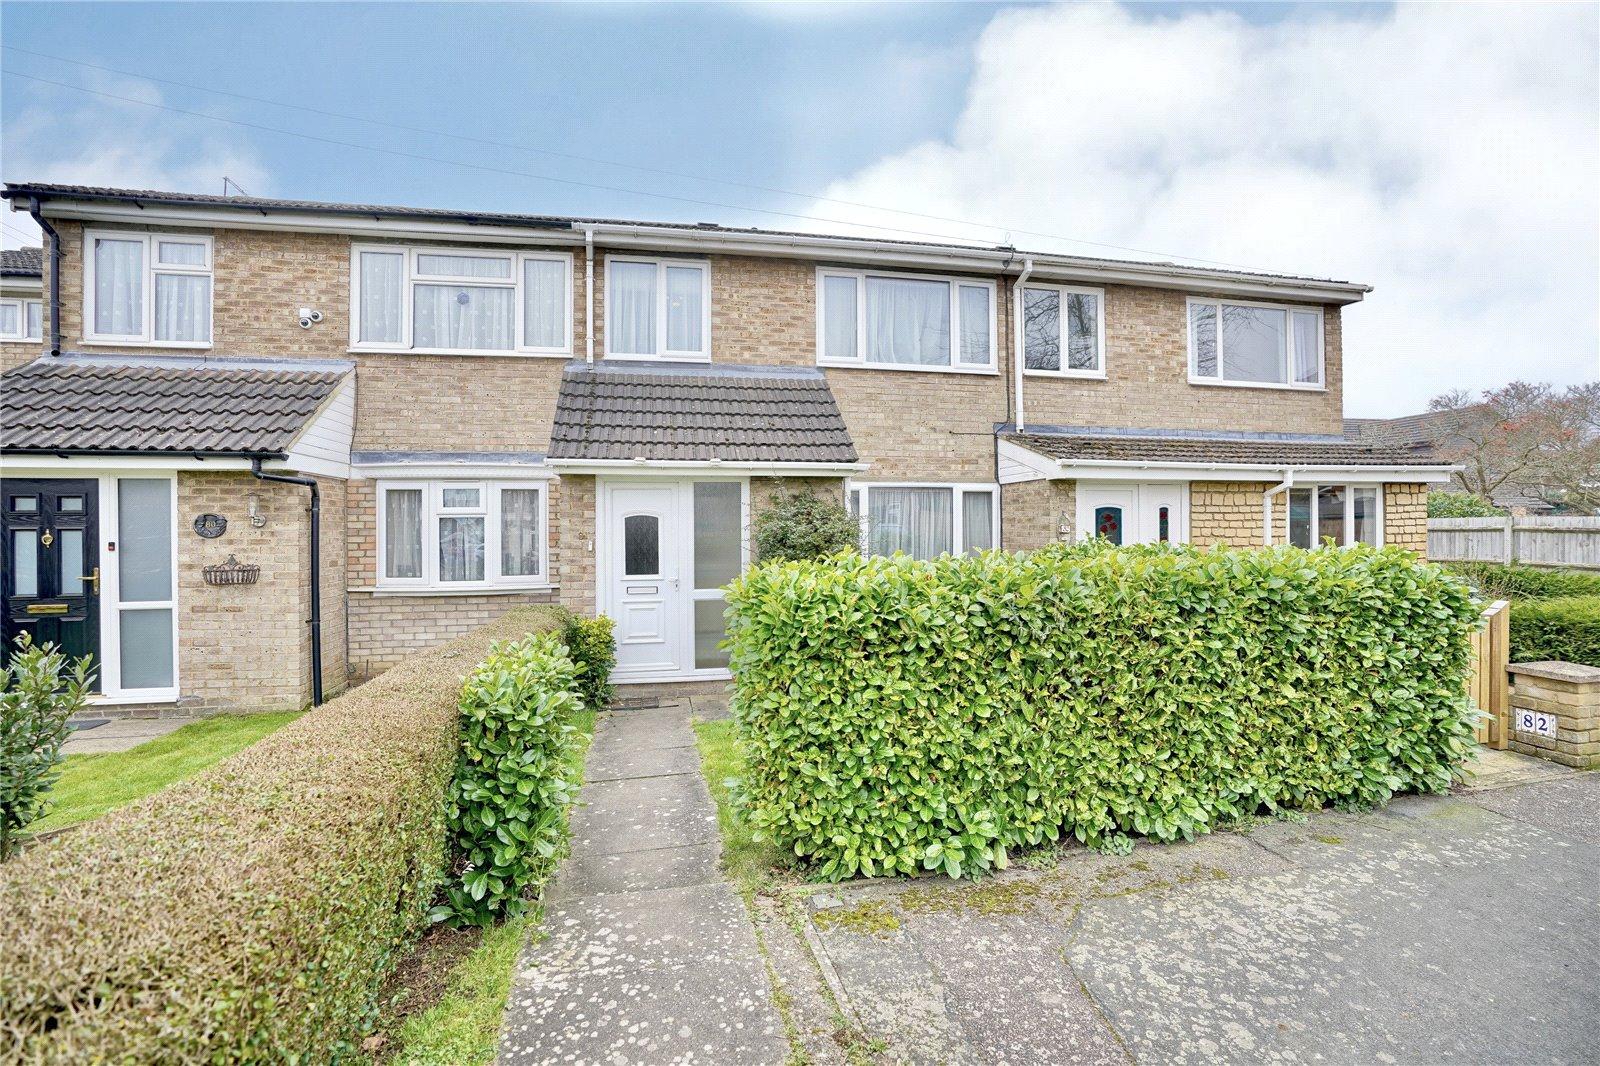 3 bed house for sale in Eynesbury, Ridgeway, PE19 2RA, PE19